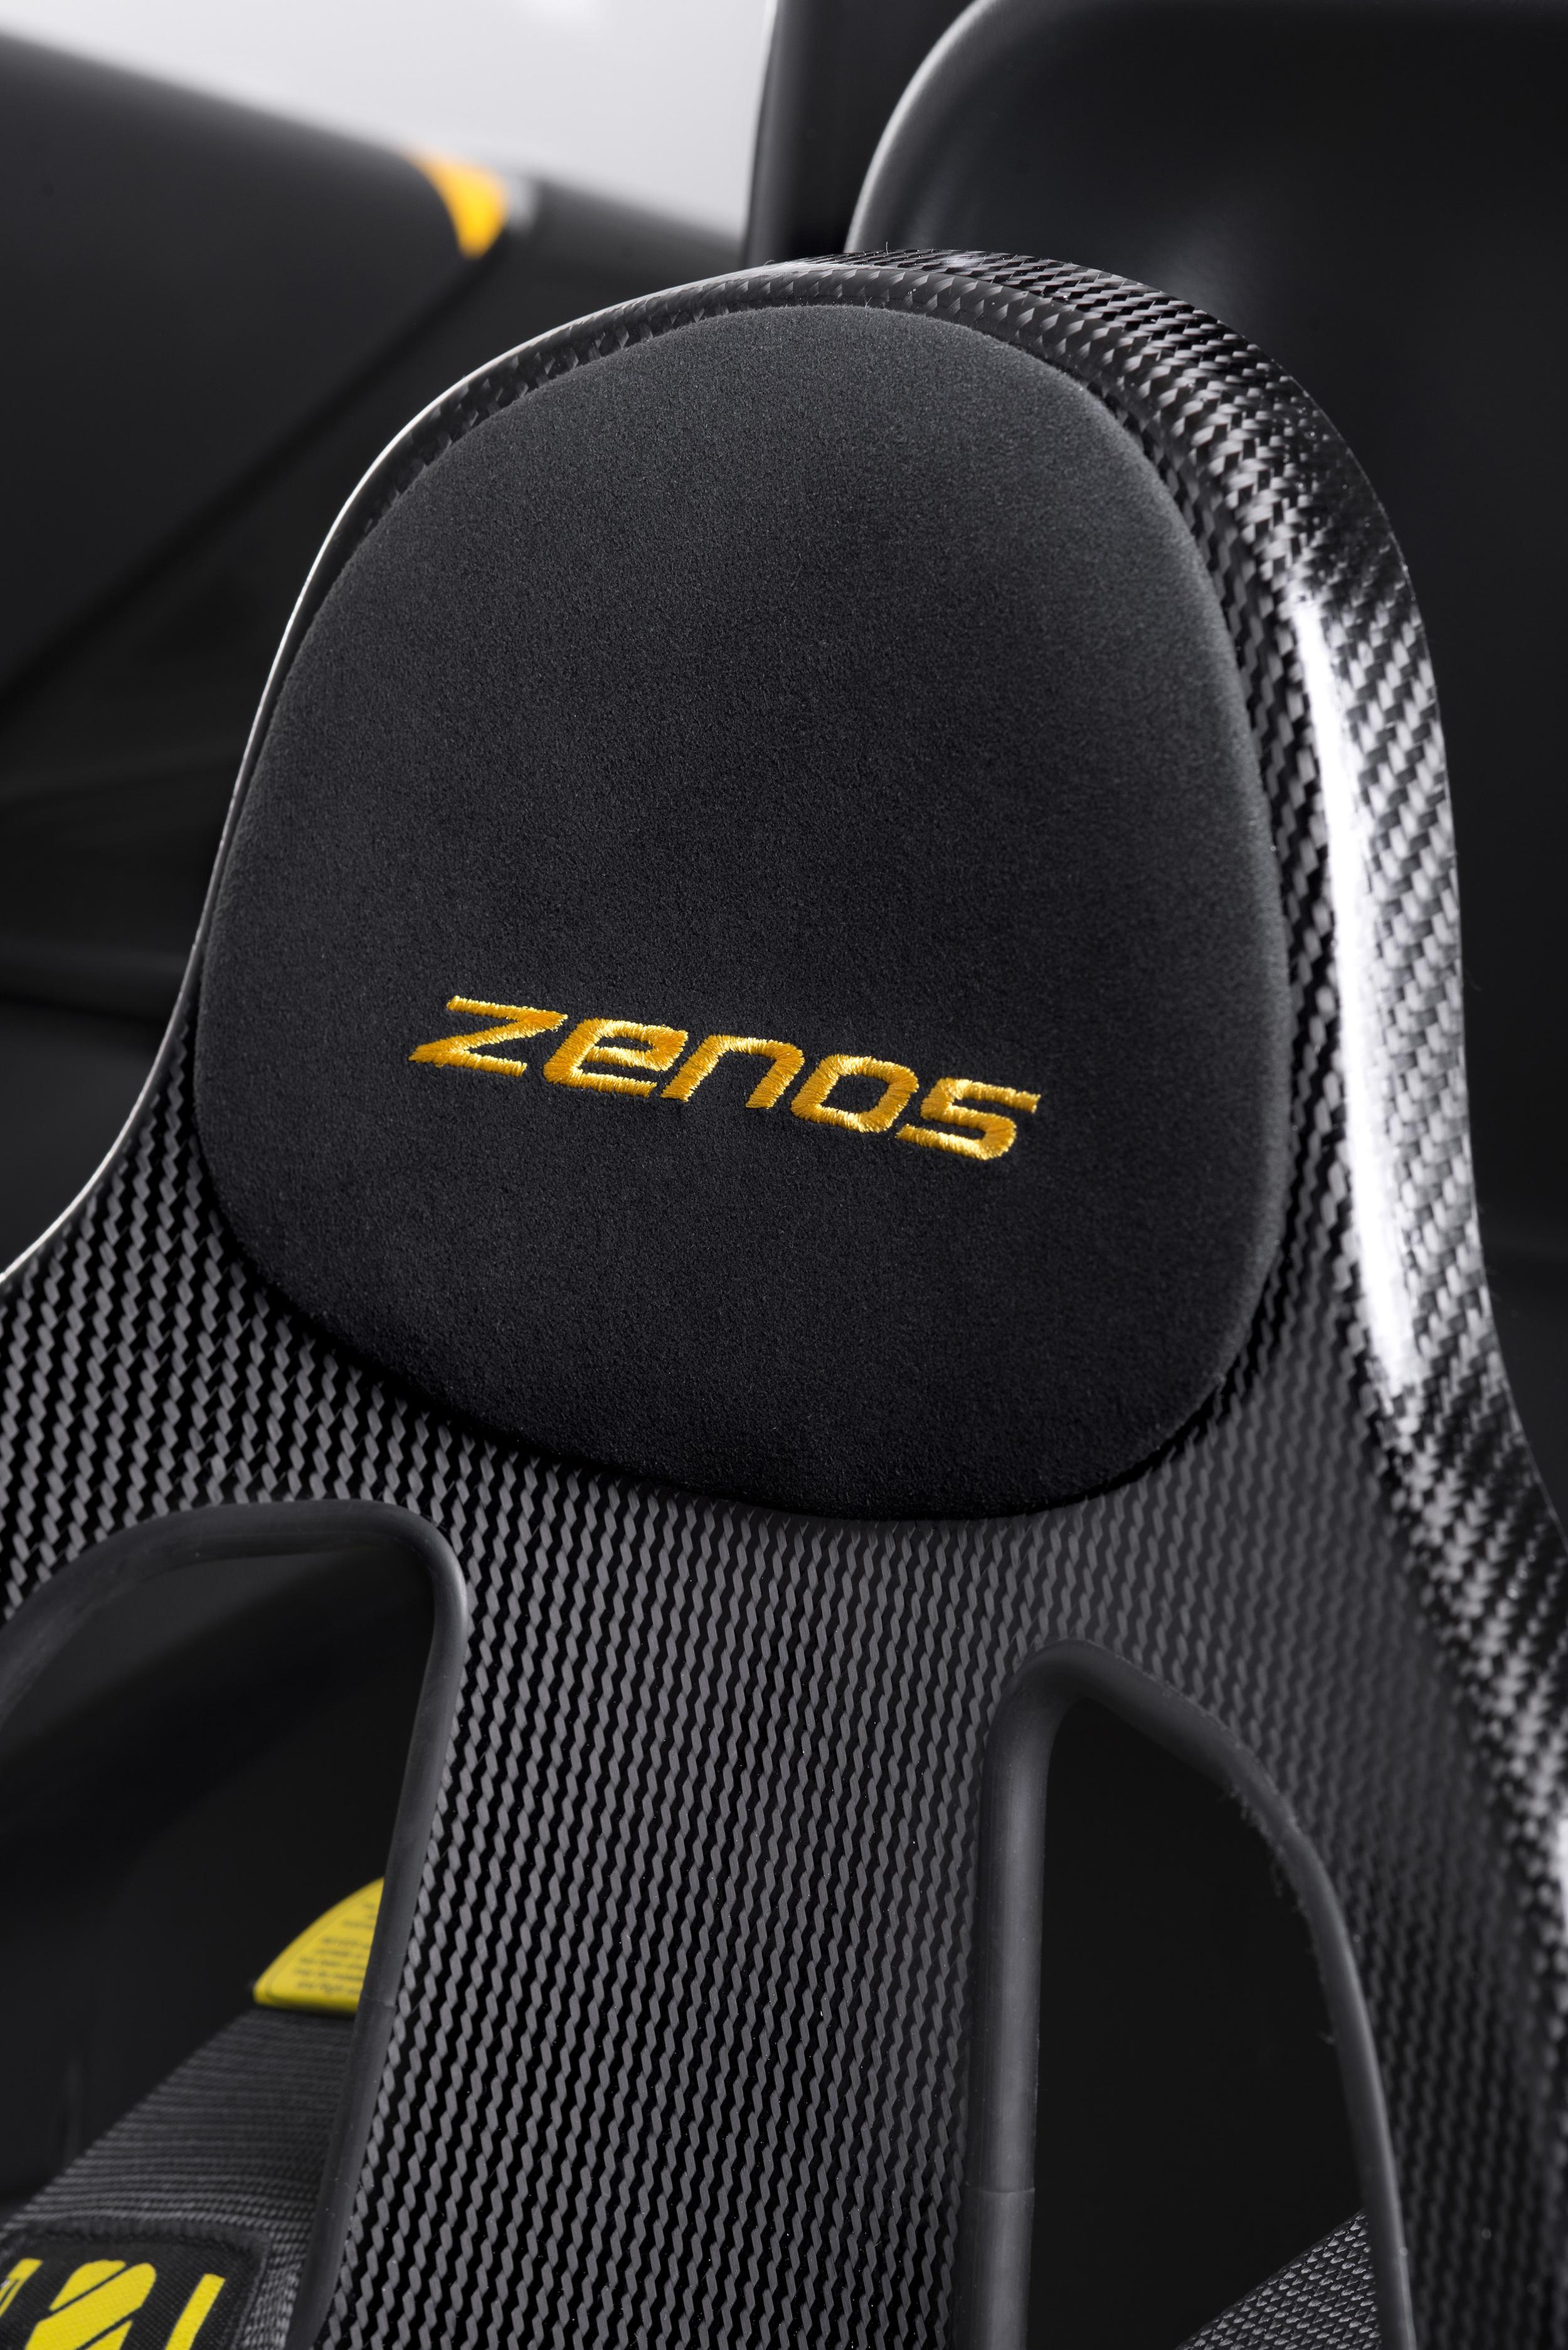 Zenos plans more powerful E10 'R'